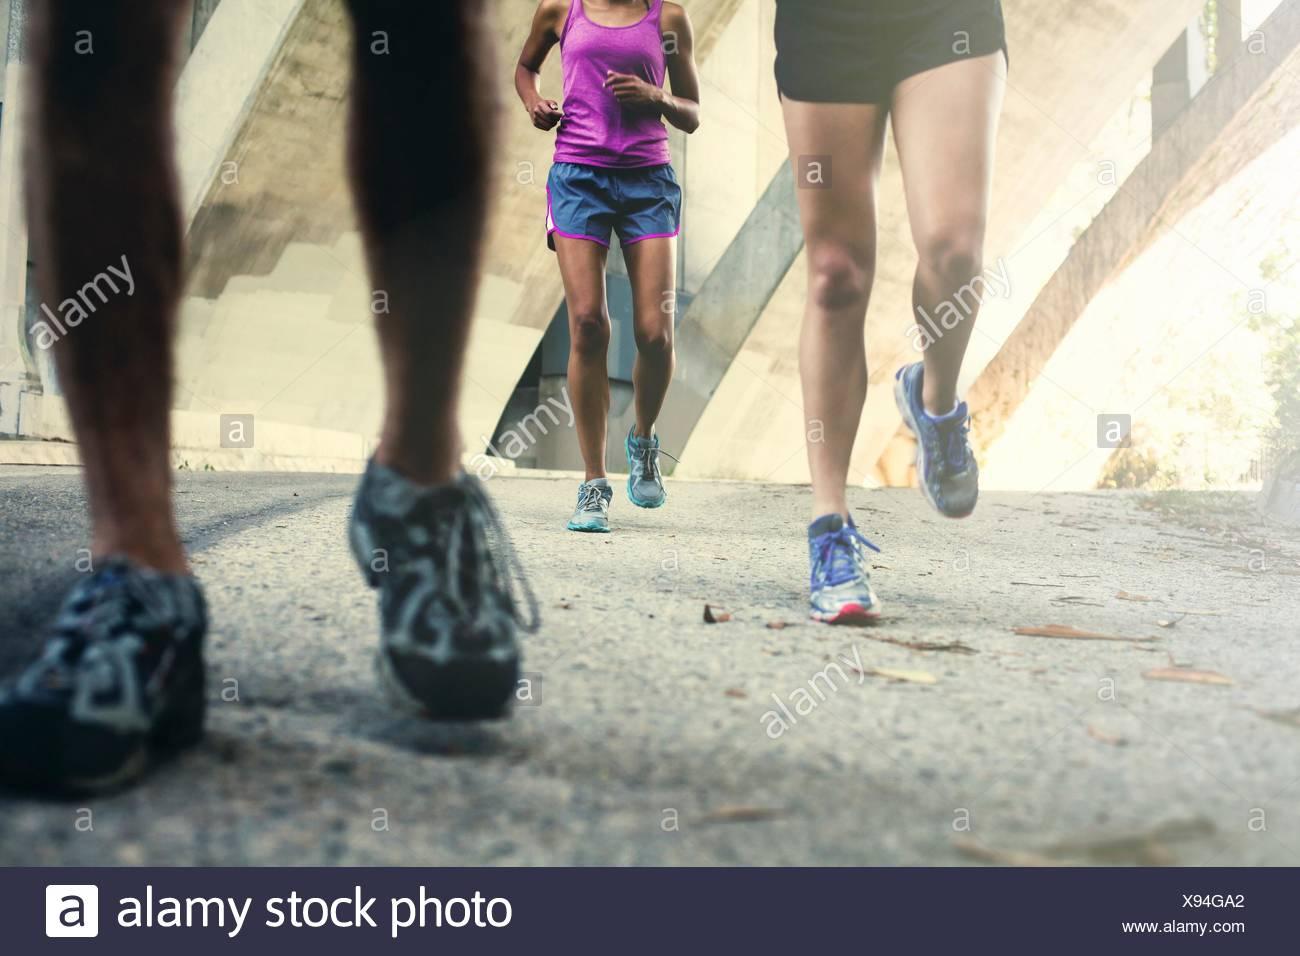 Joggers running on bridge - Stock Image